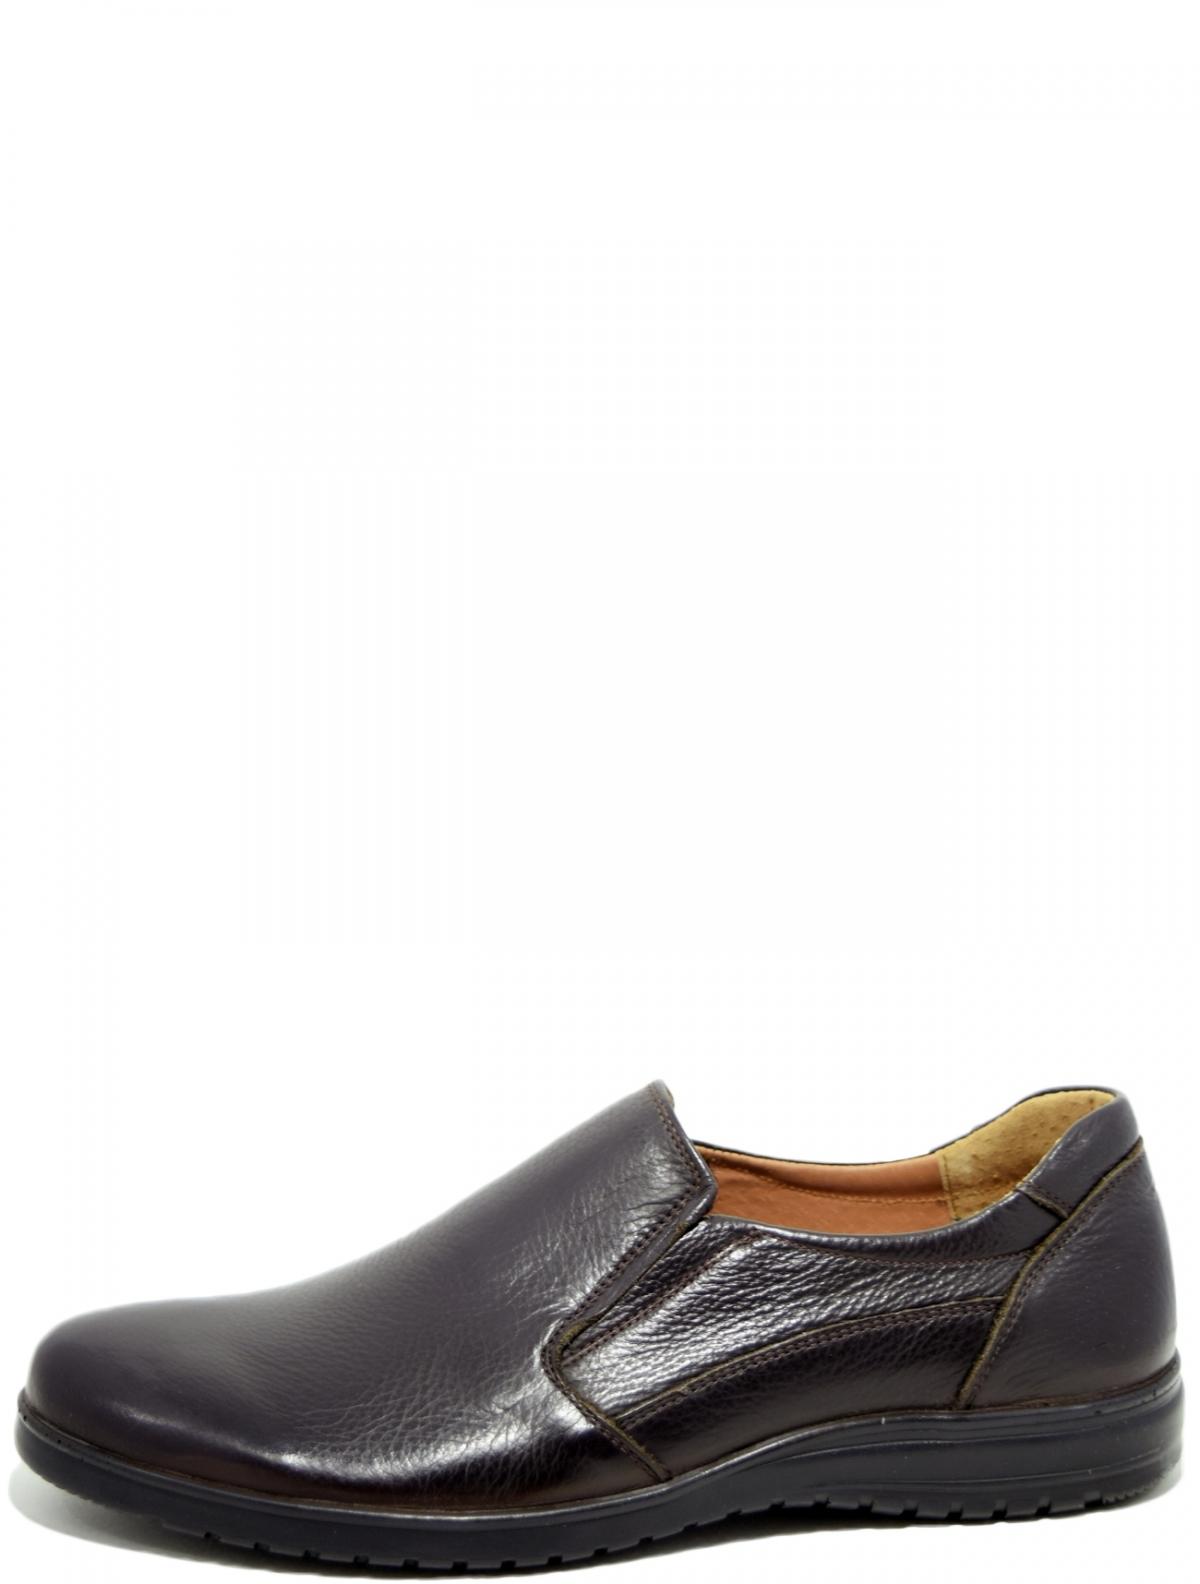 Bossner 5-315-304-1 мужские туфли